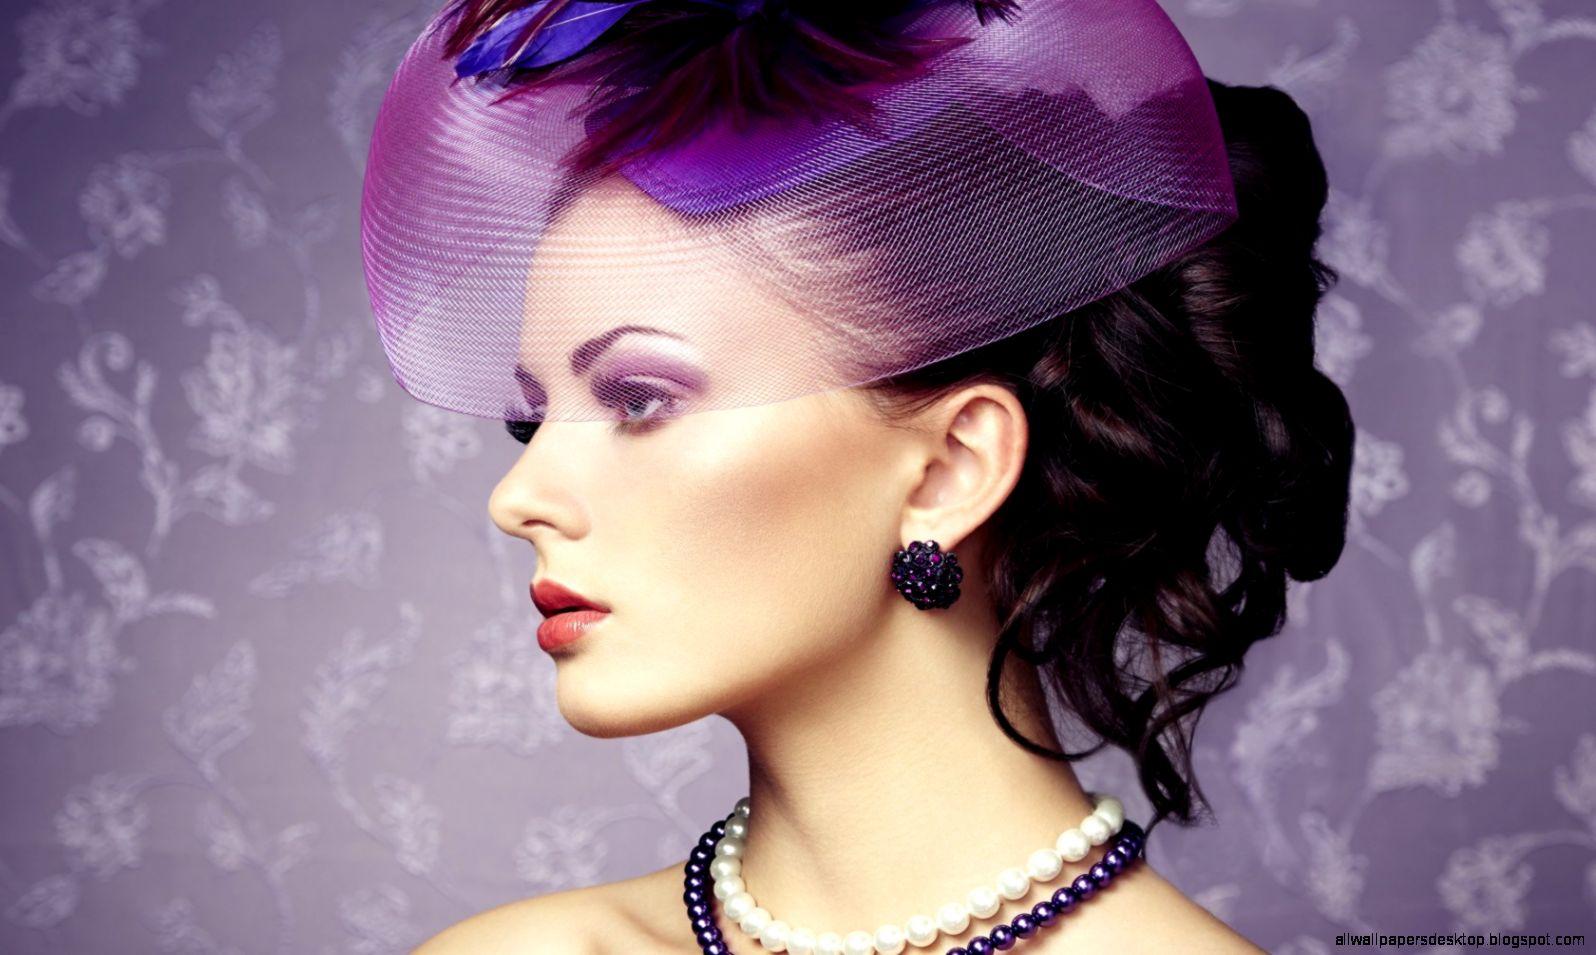 Cool Makeup Wallpaper 6899149